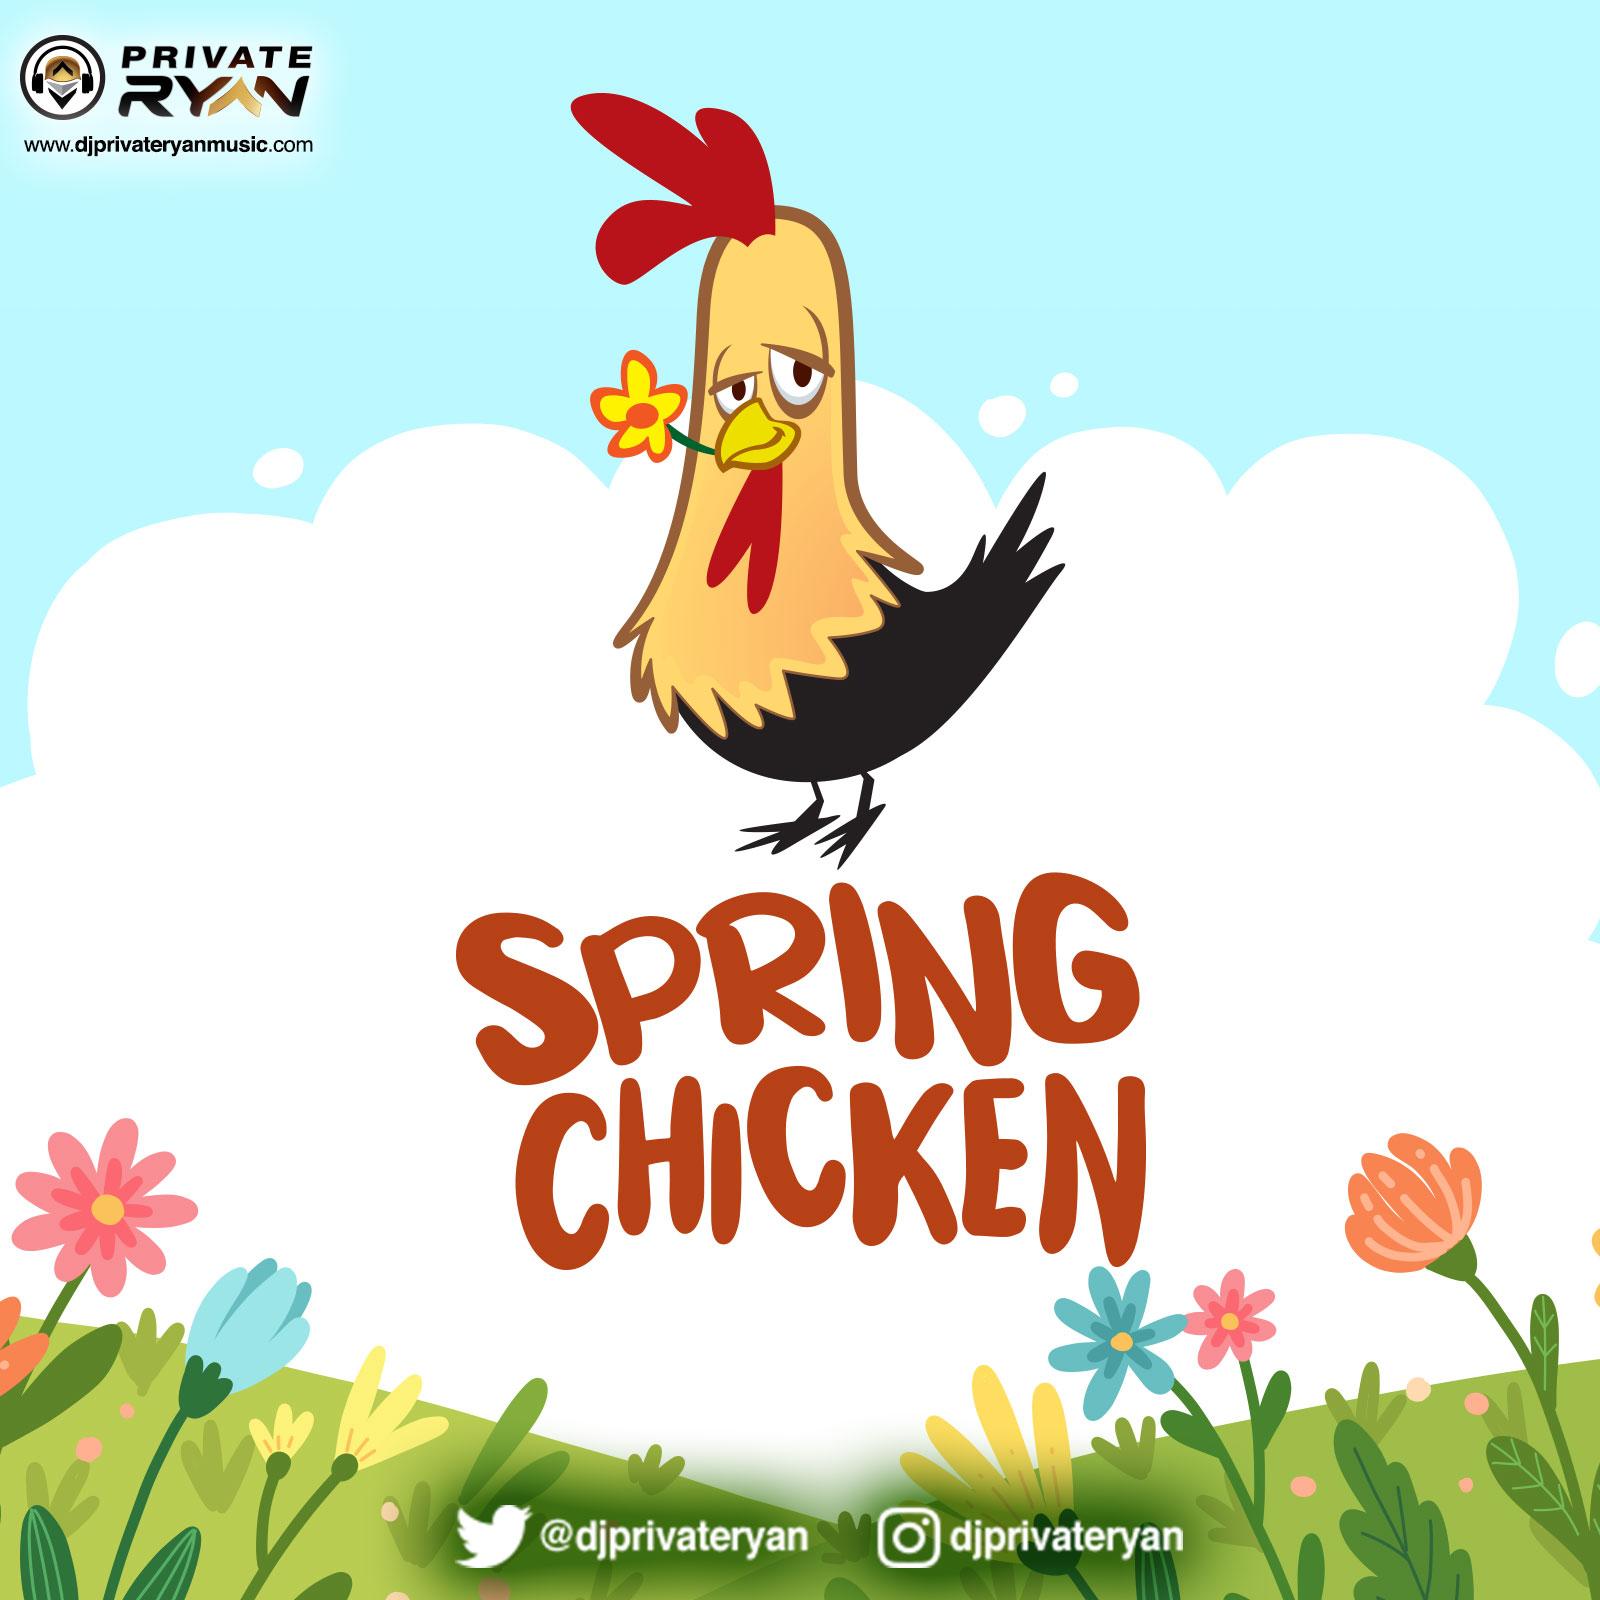 Private Ryan Presents Spring Chicken 2021